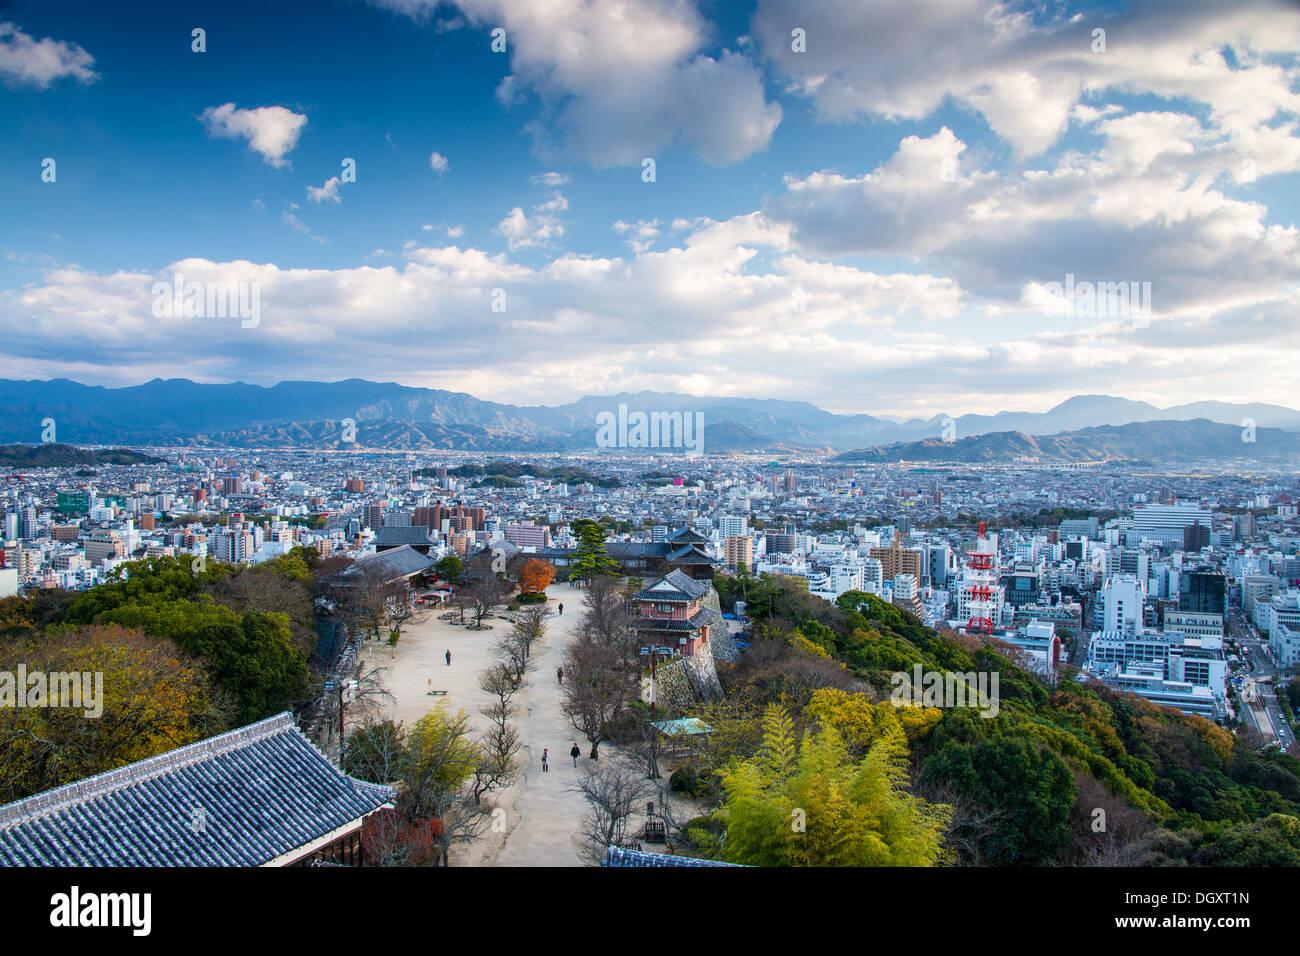 Matsuyama, Japan from Matsuyama Castle. - Stock Image